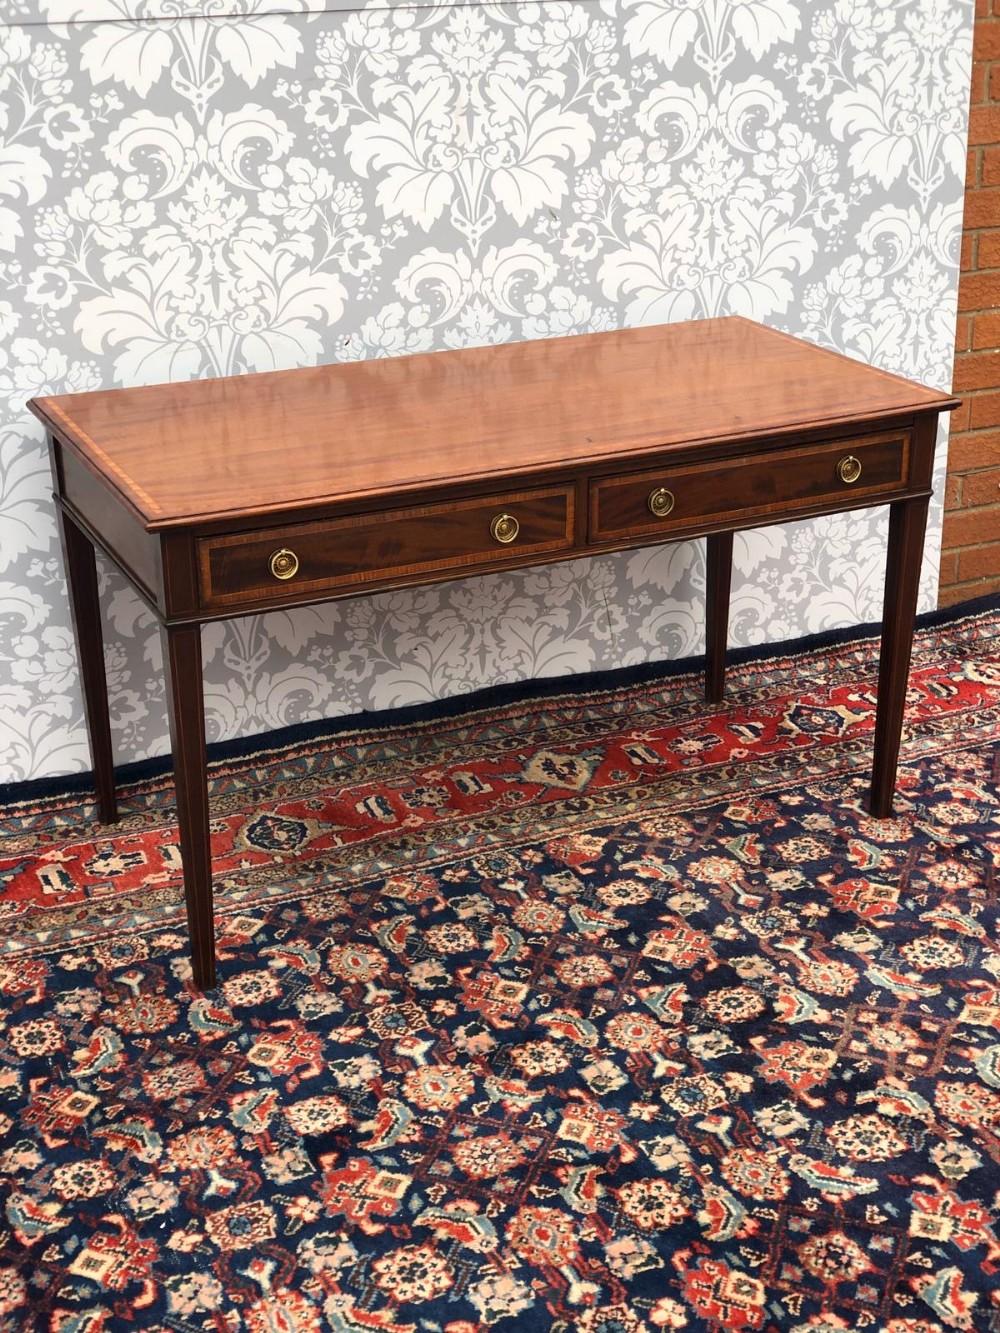 stunning inlaid 2 drawer writing desk mahogany fully restored superb order